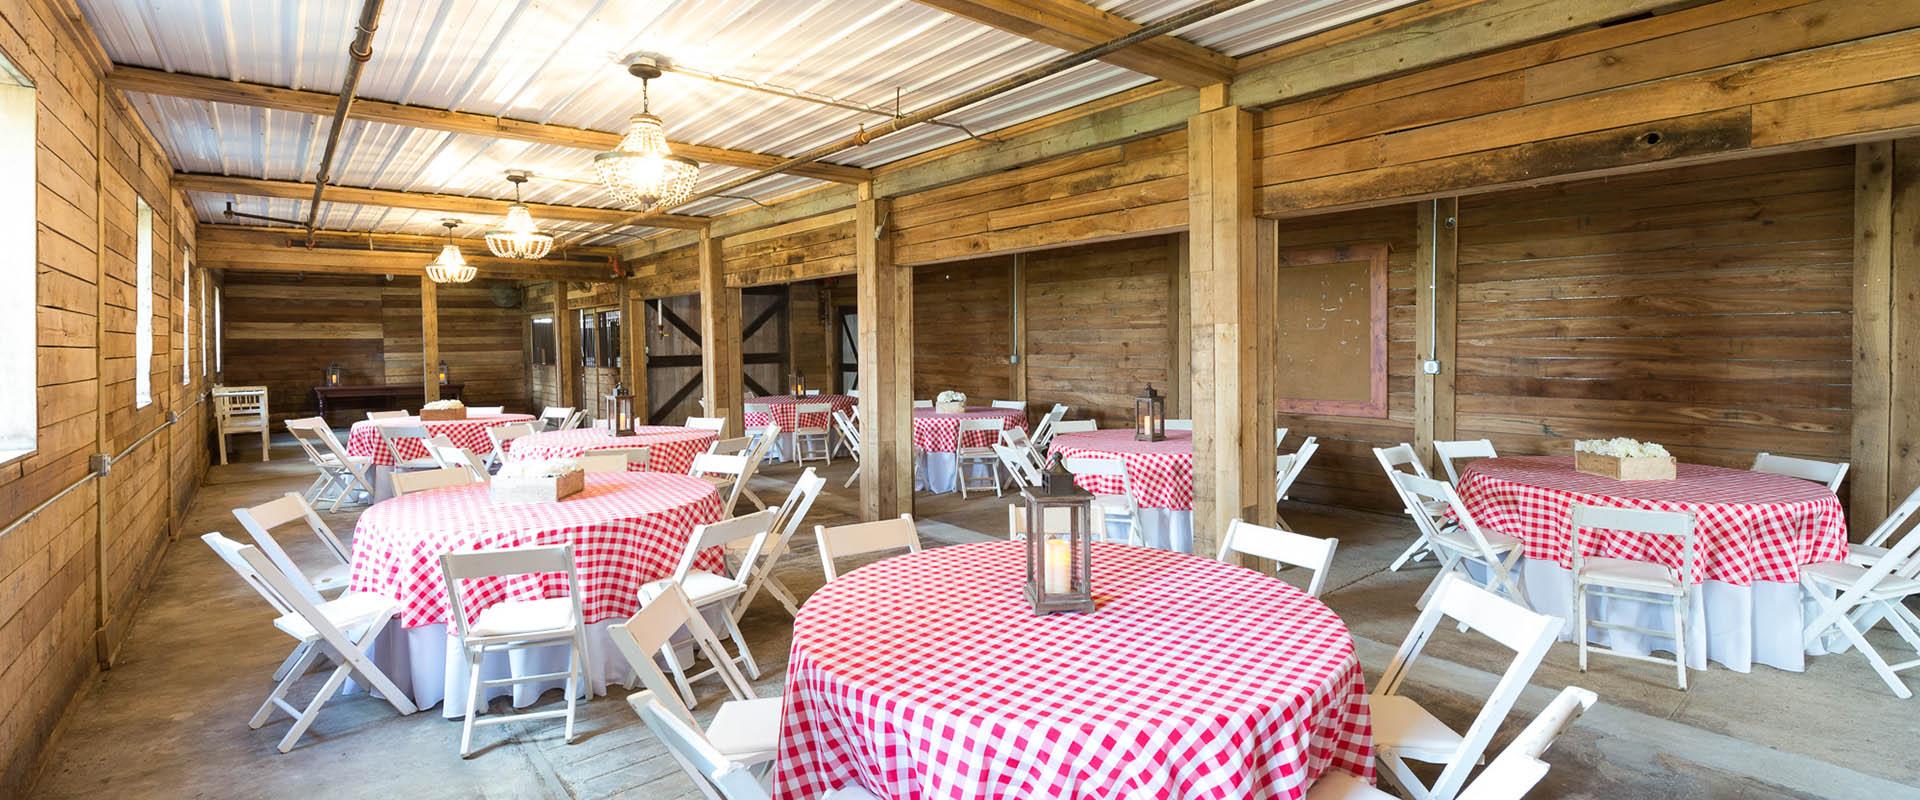 St Joe Farm Event Barn